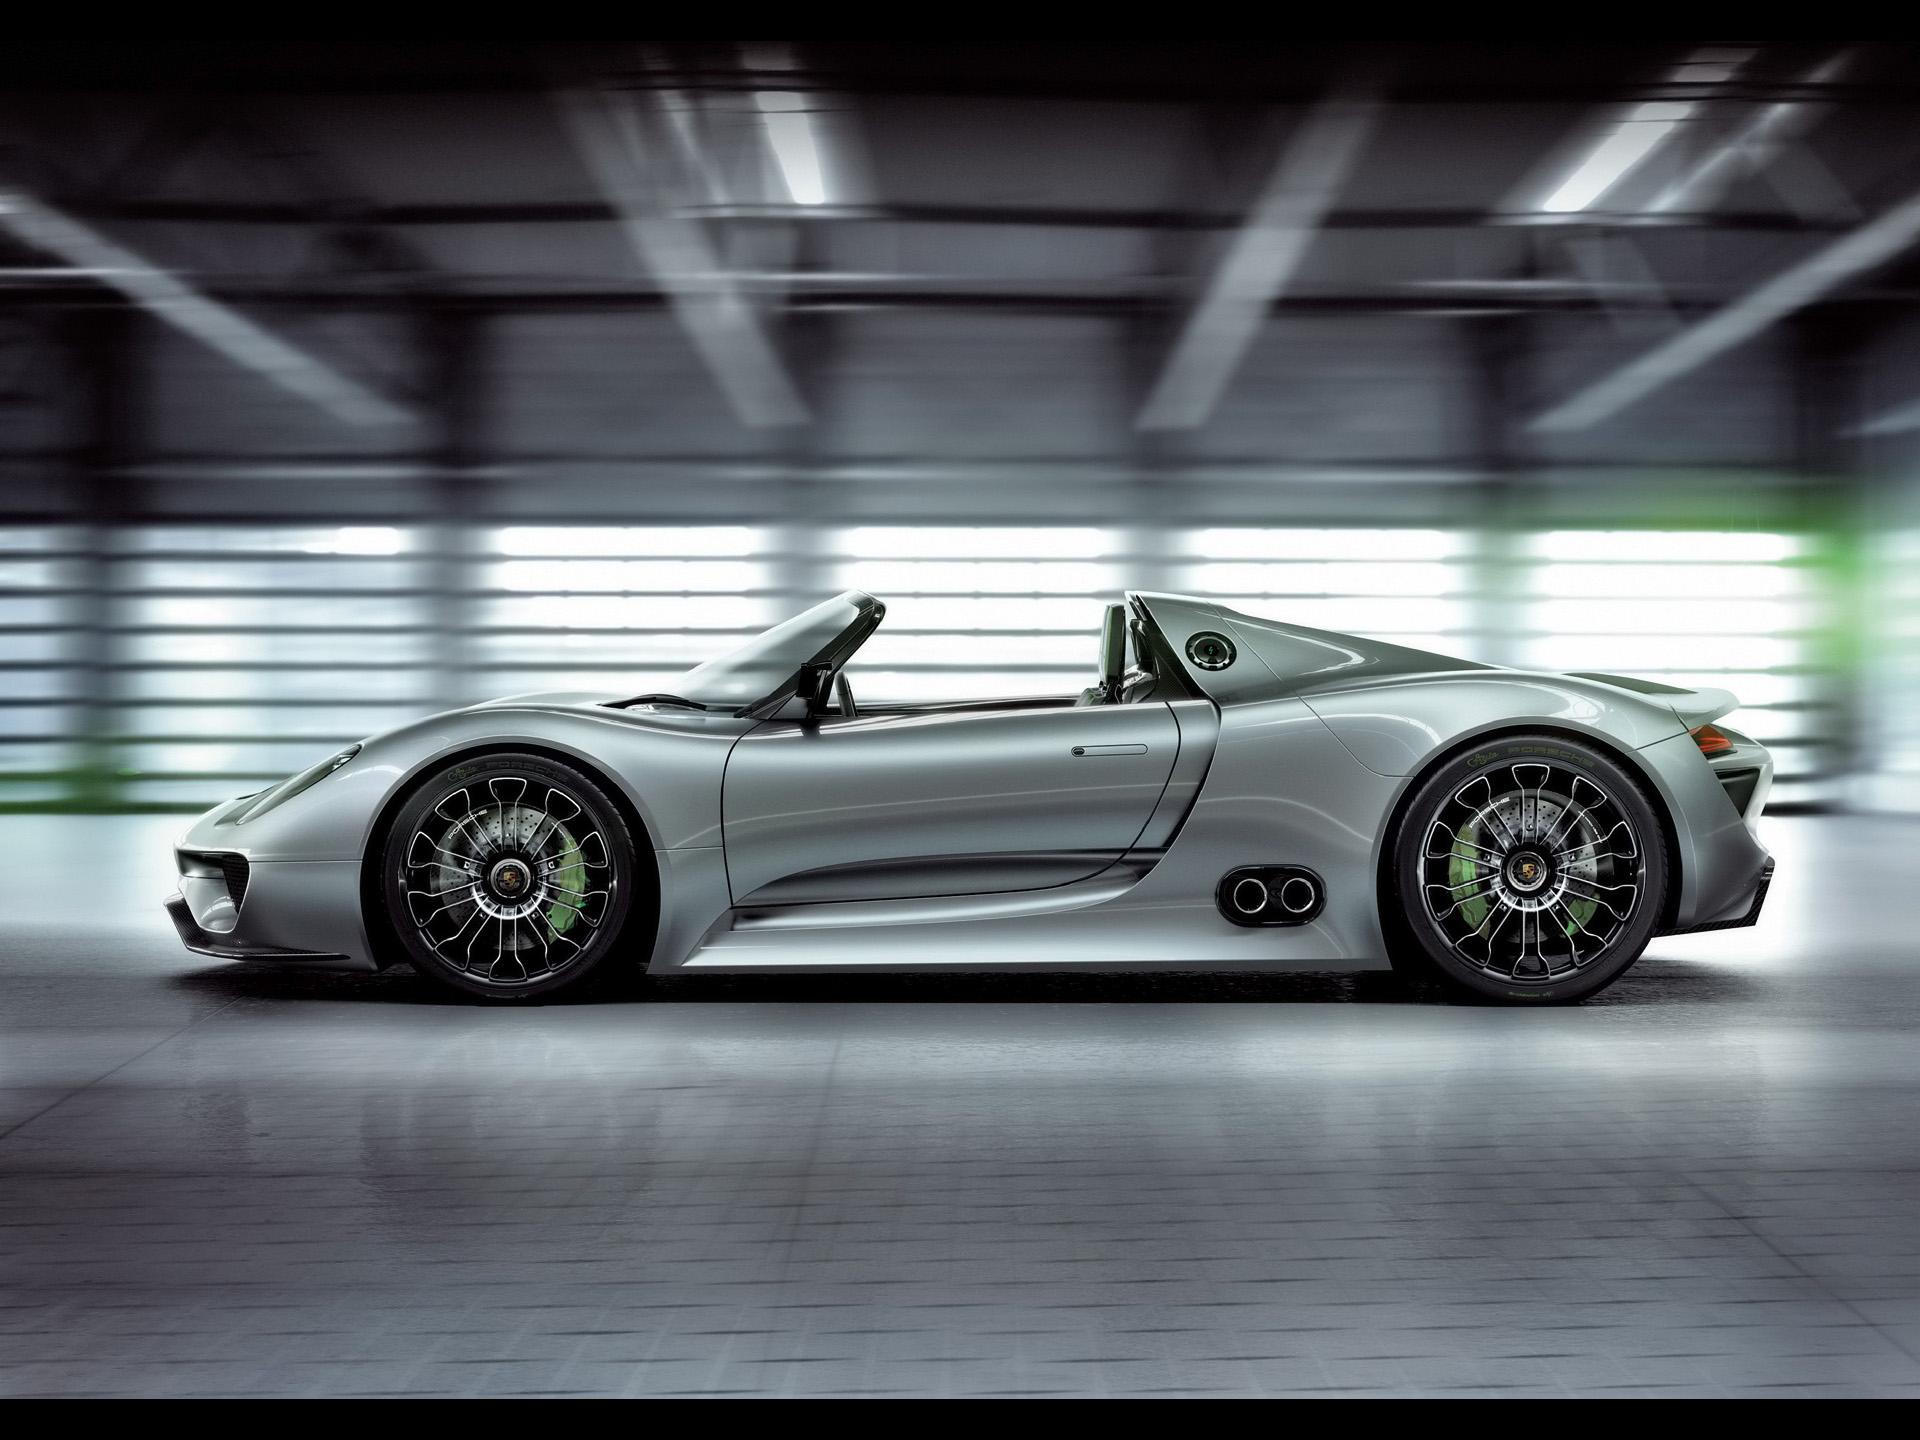 918 Spyder... Enfin... 2010-Porsche-918-Spyder-Concept-Side-1920x1440